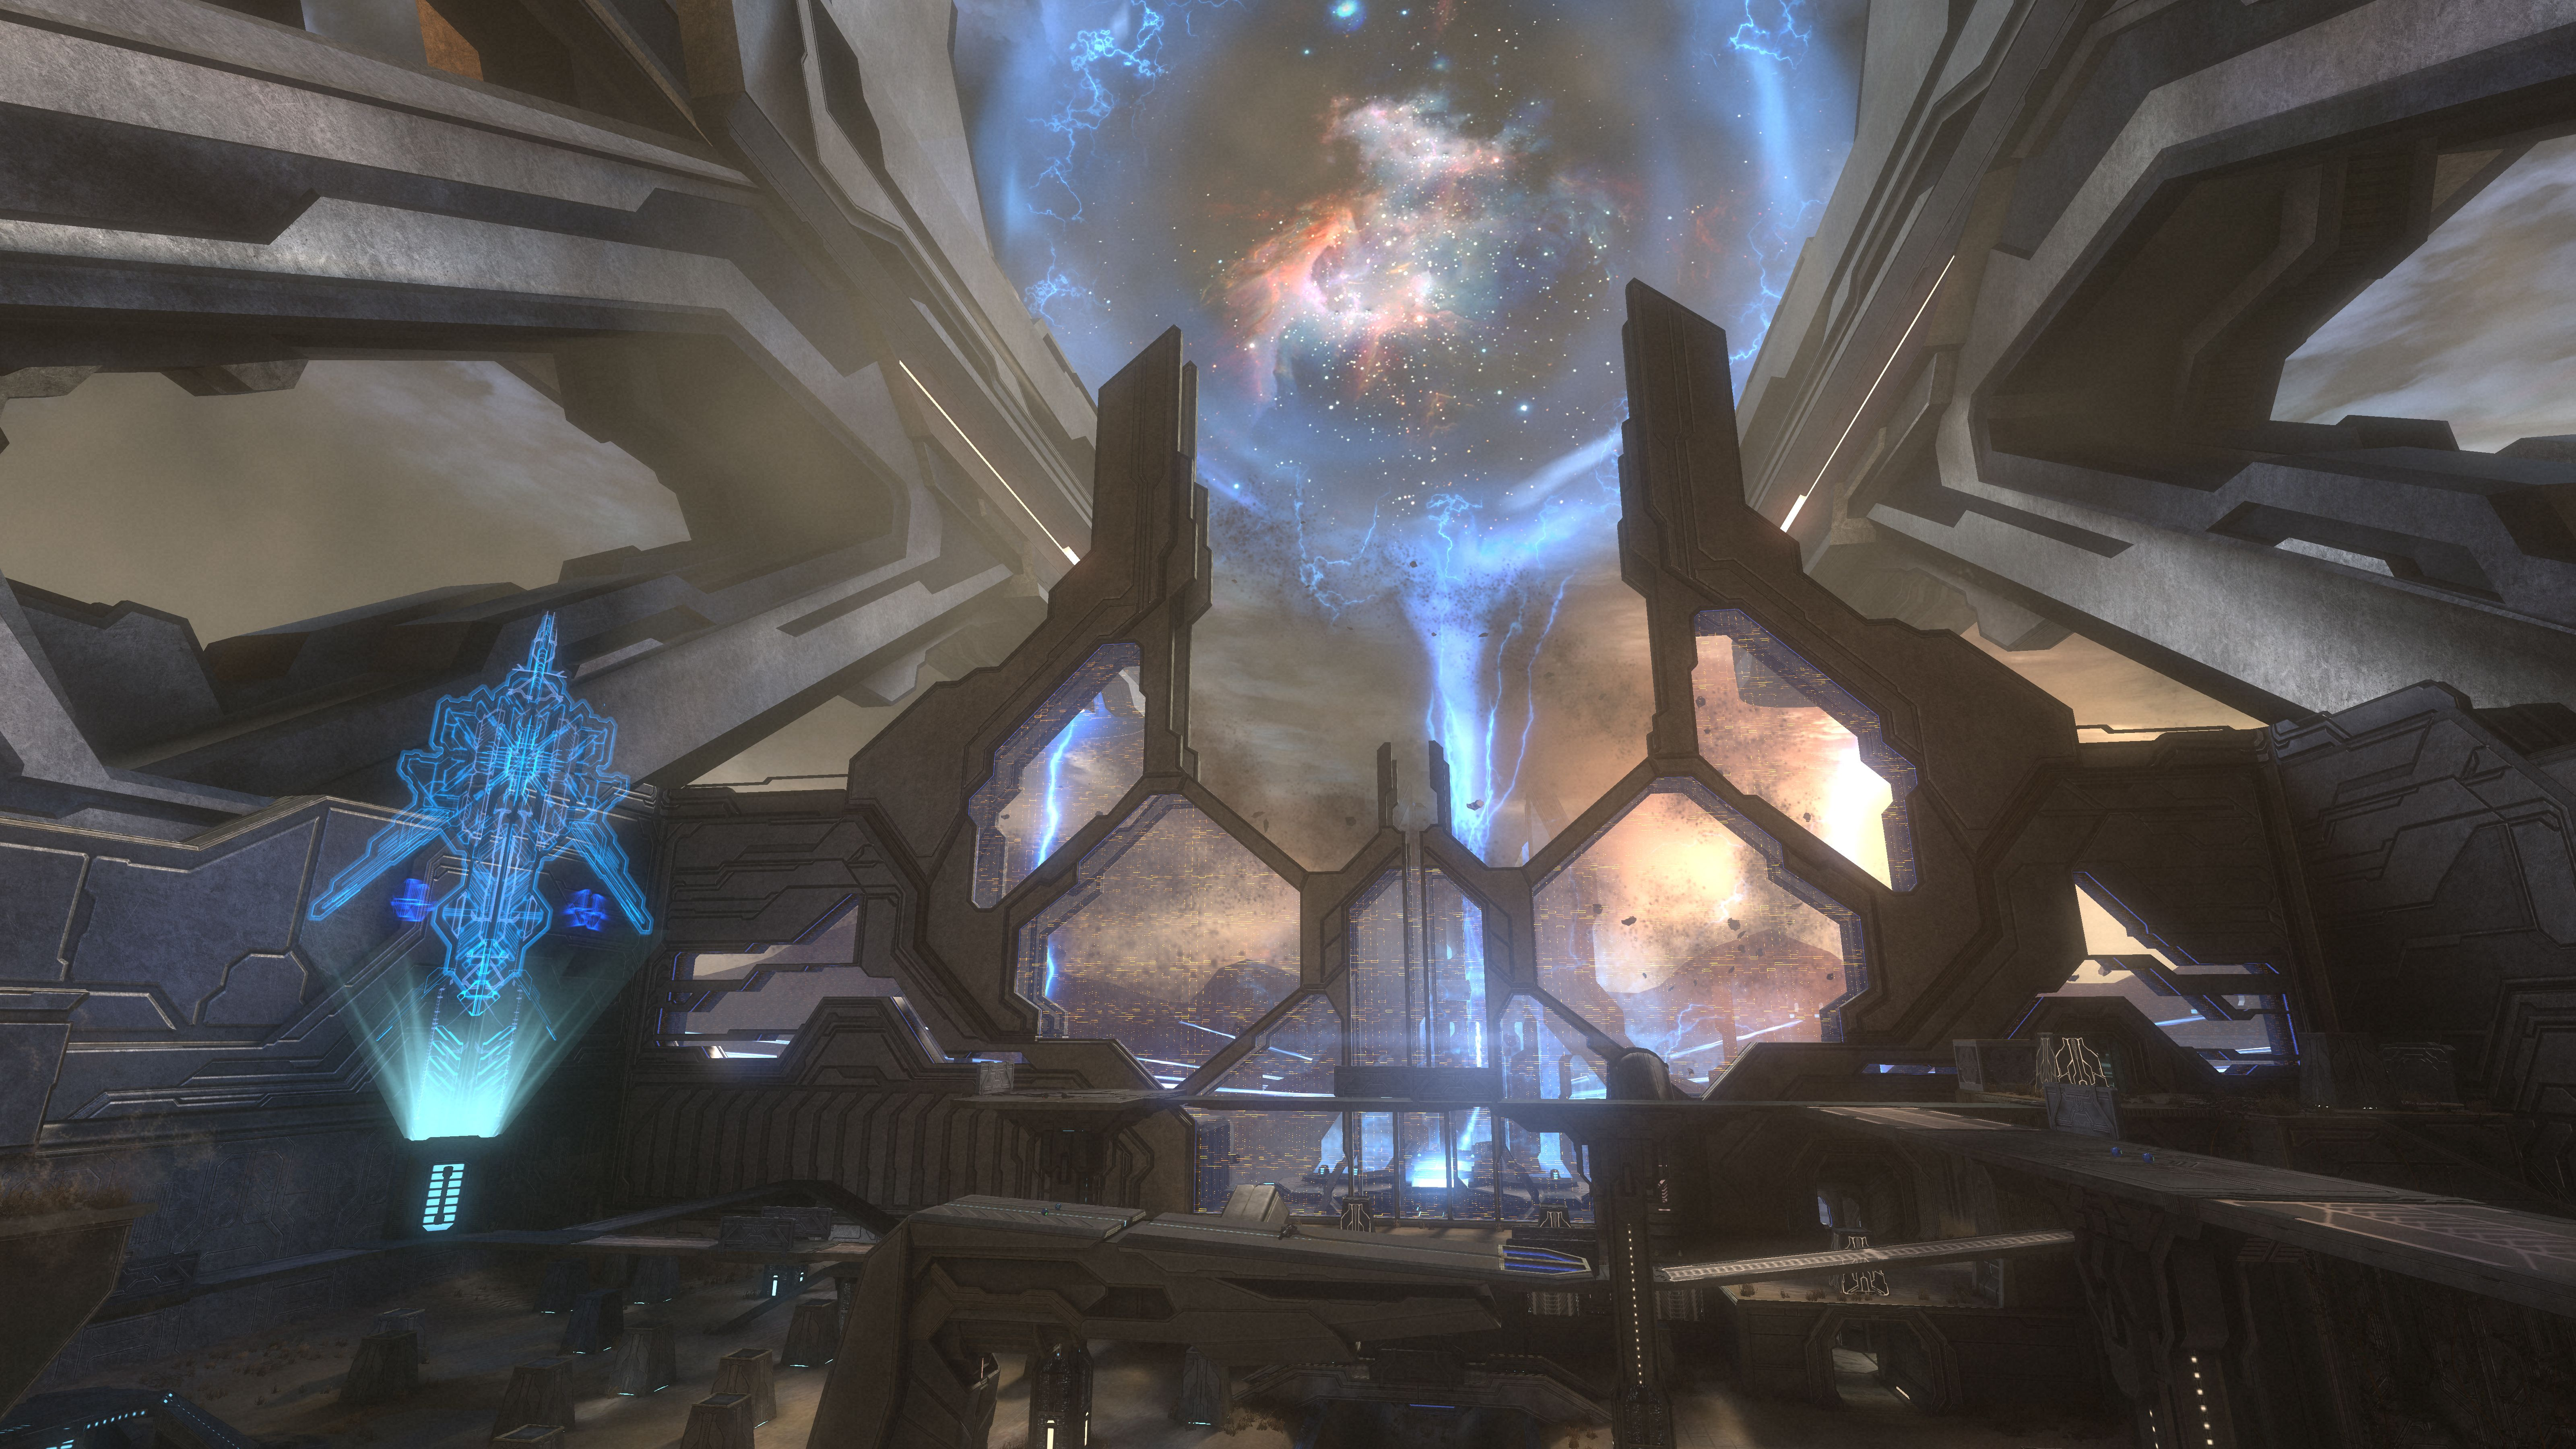 Halo: Combat Evolved Anniversary - Halo: Combat Evolved Anniversary 6K